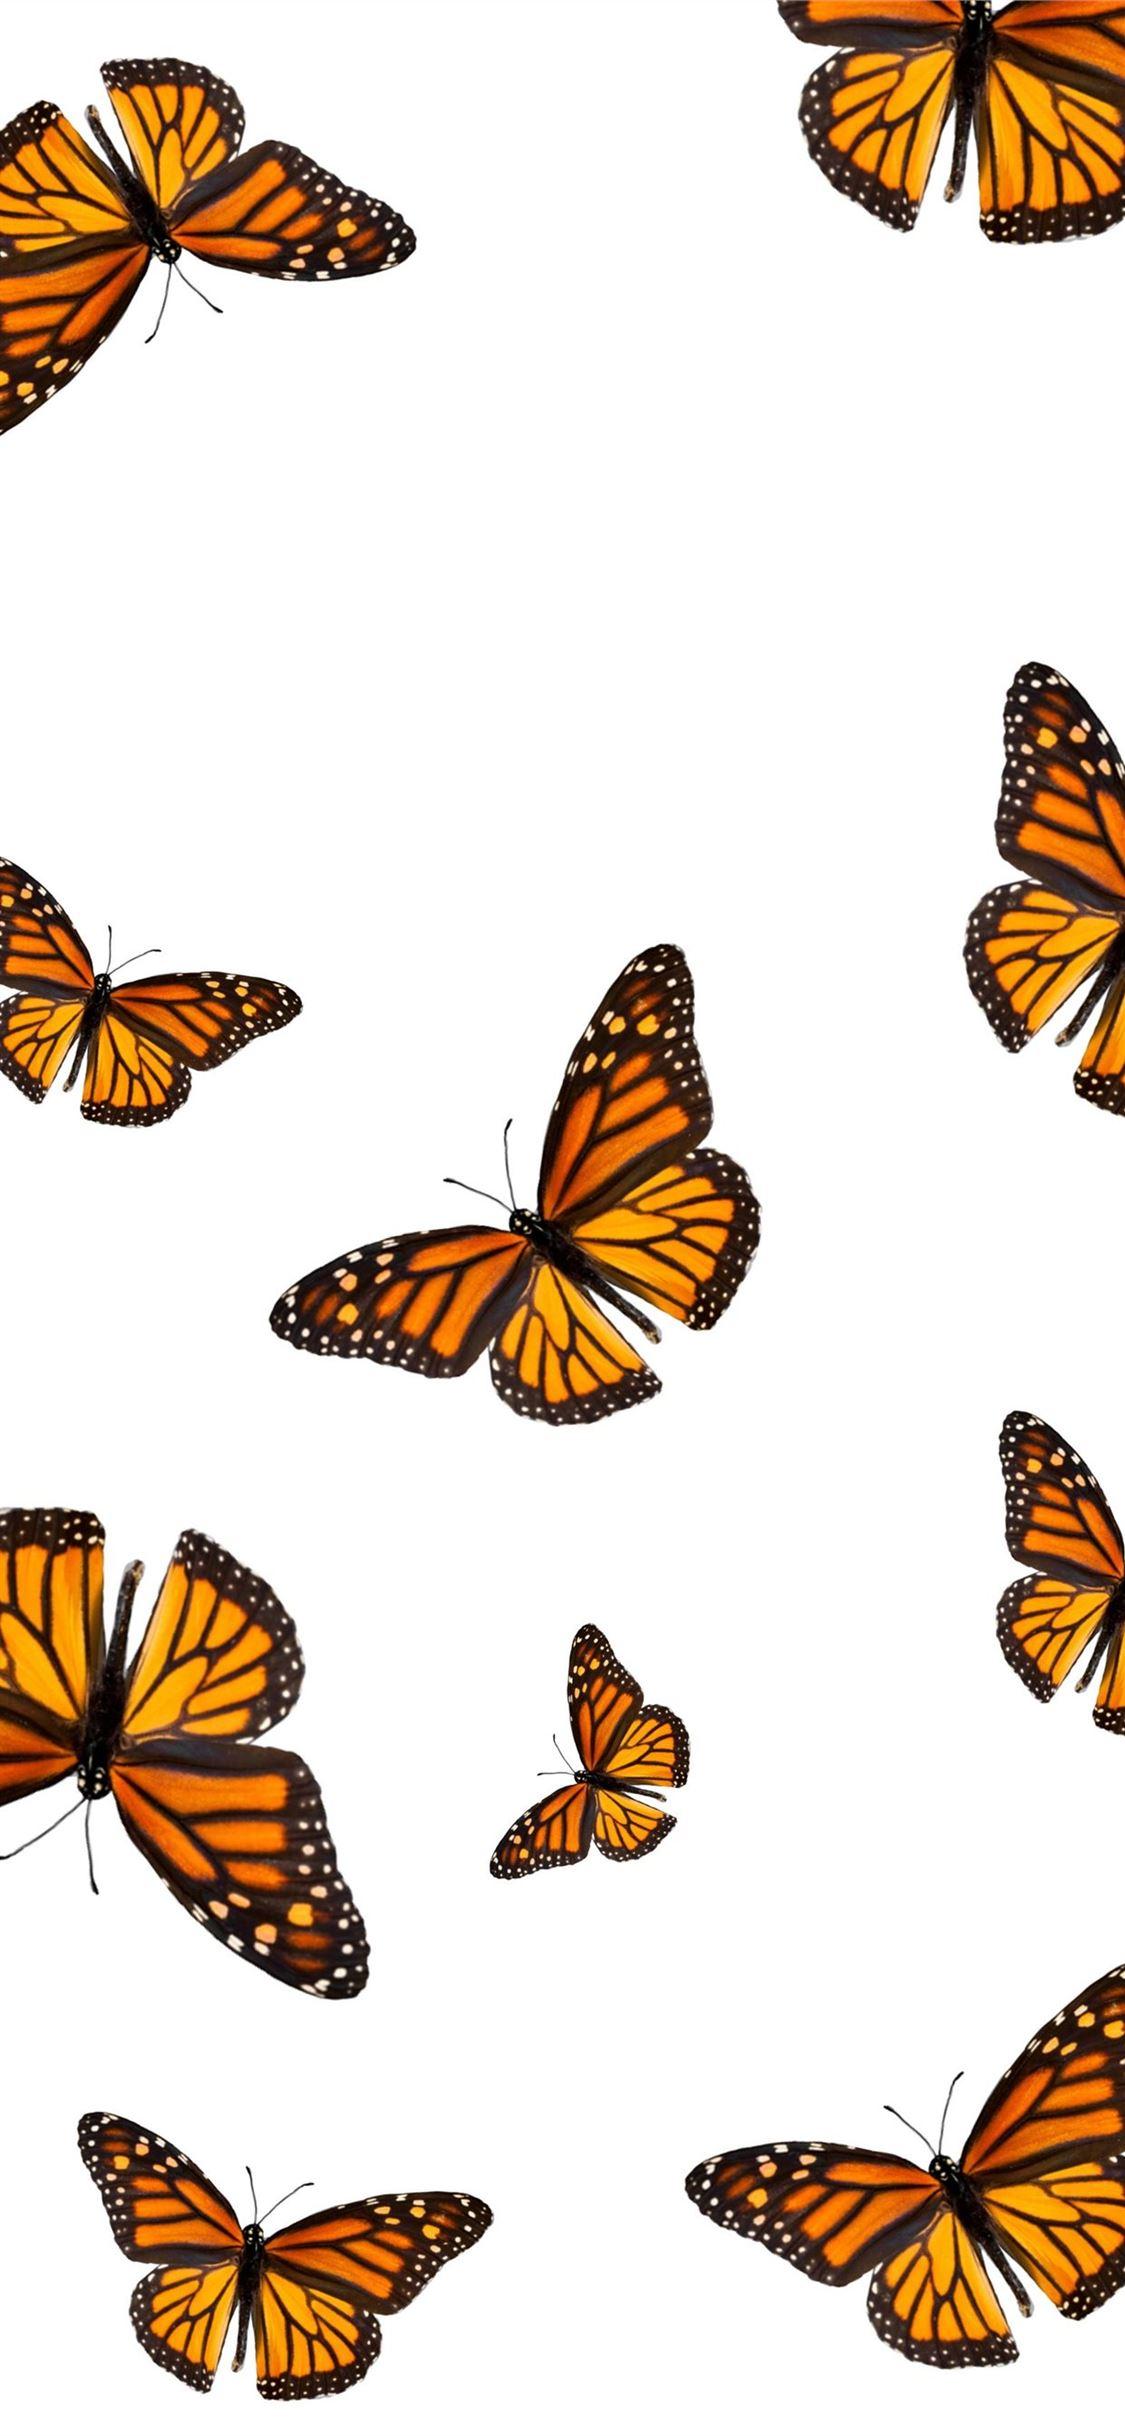 Butterfly Wallpaper Iphone 11 2837592 Hd Wallpaper Backgrounds Download